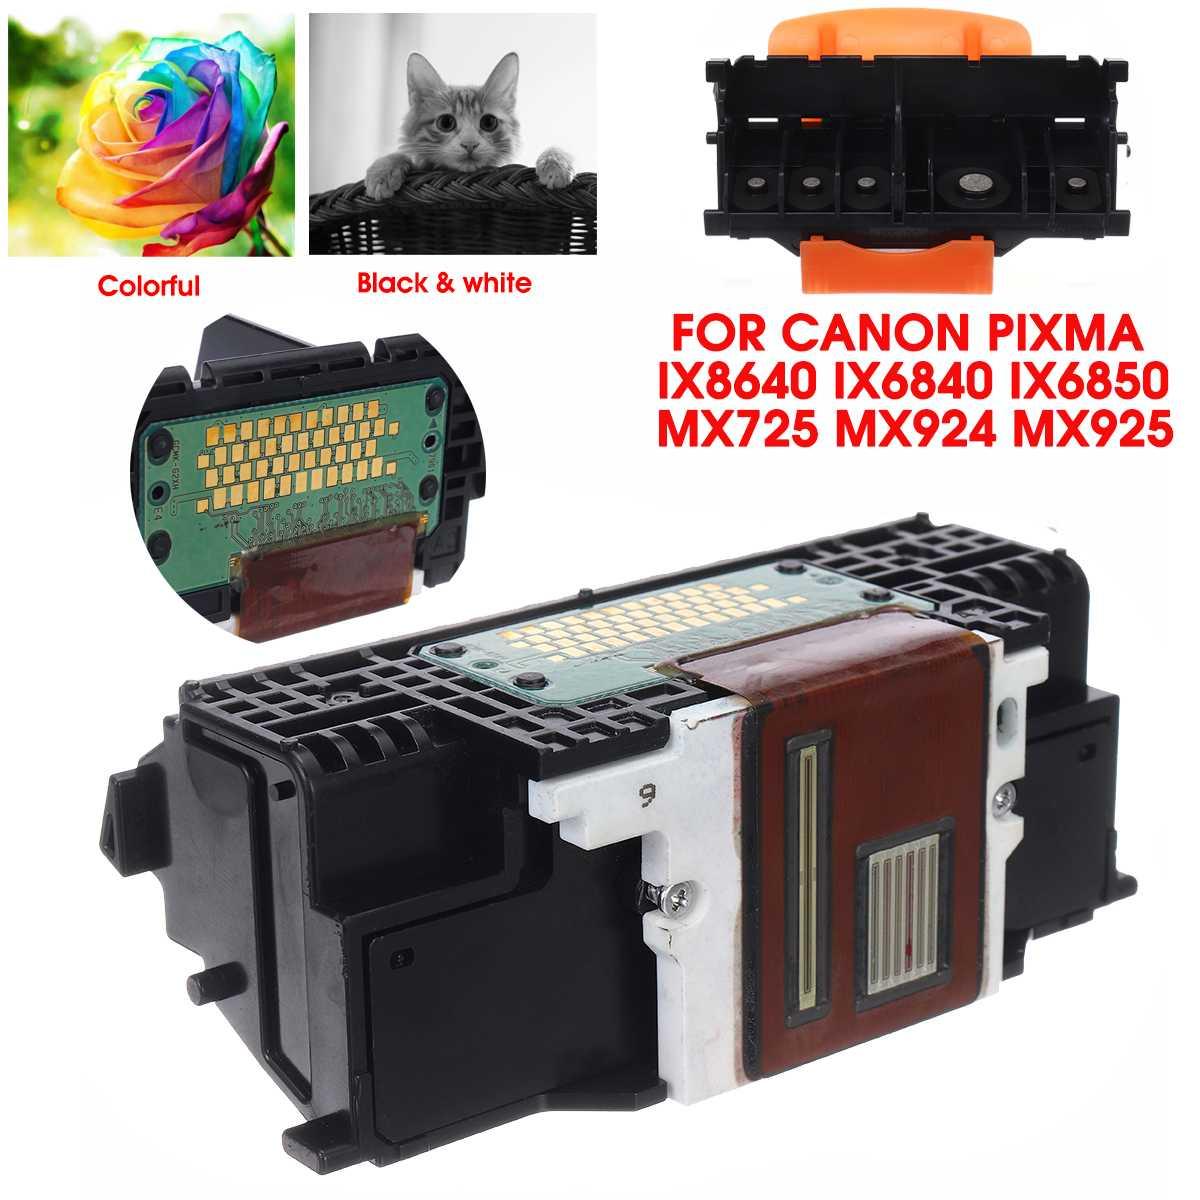 LEORY QY6-0086-000 Drucker Druckkopf Druckkopf Drucker Teile Zubehör Für Canon Pixma iX8640 iX6840 iX6850 MX725 MX924 MX925